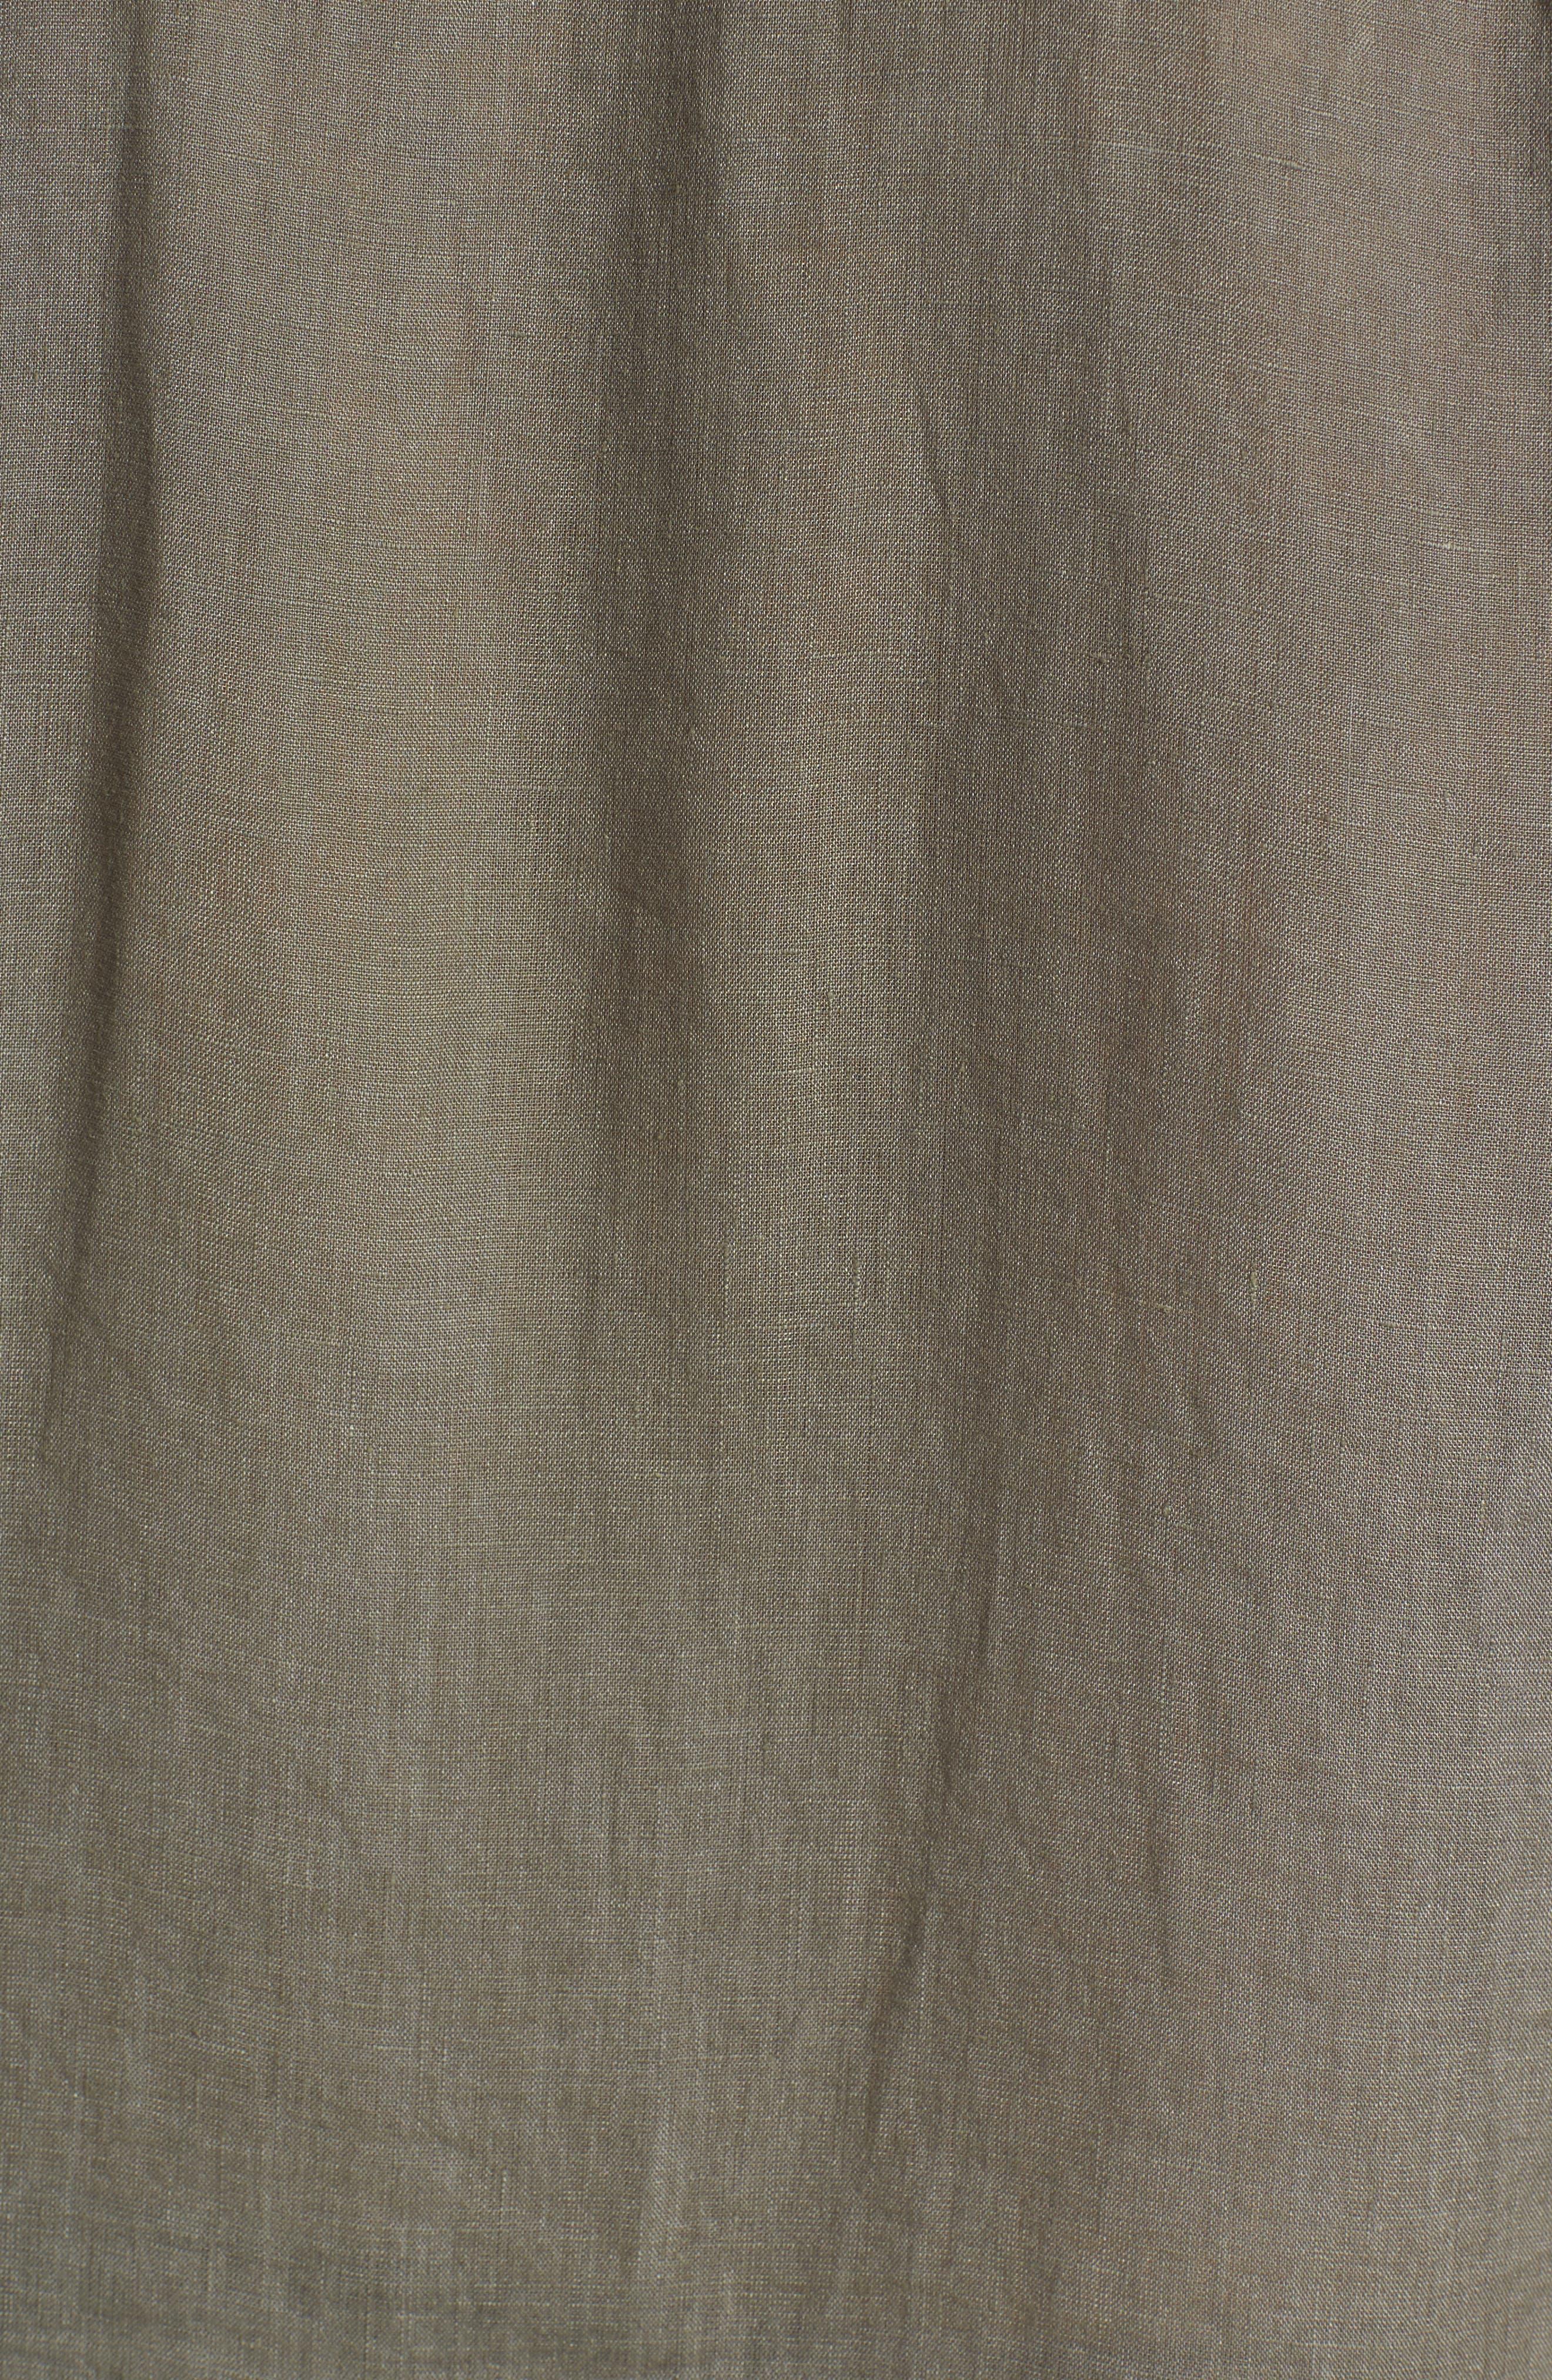 Trim Fit Linen Sport Shirt,                             Alternate thumbnail 5, color,                             Desert Green